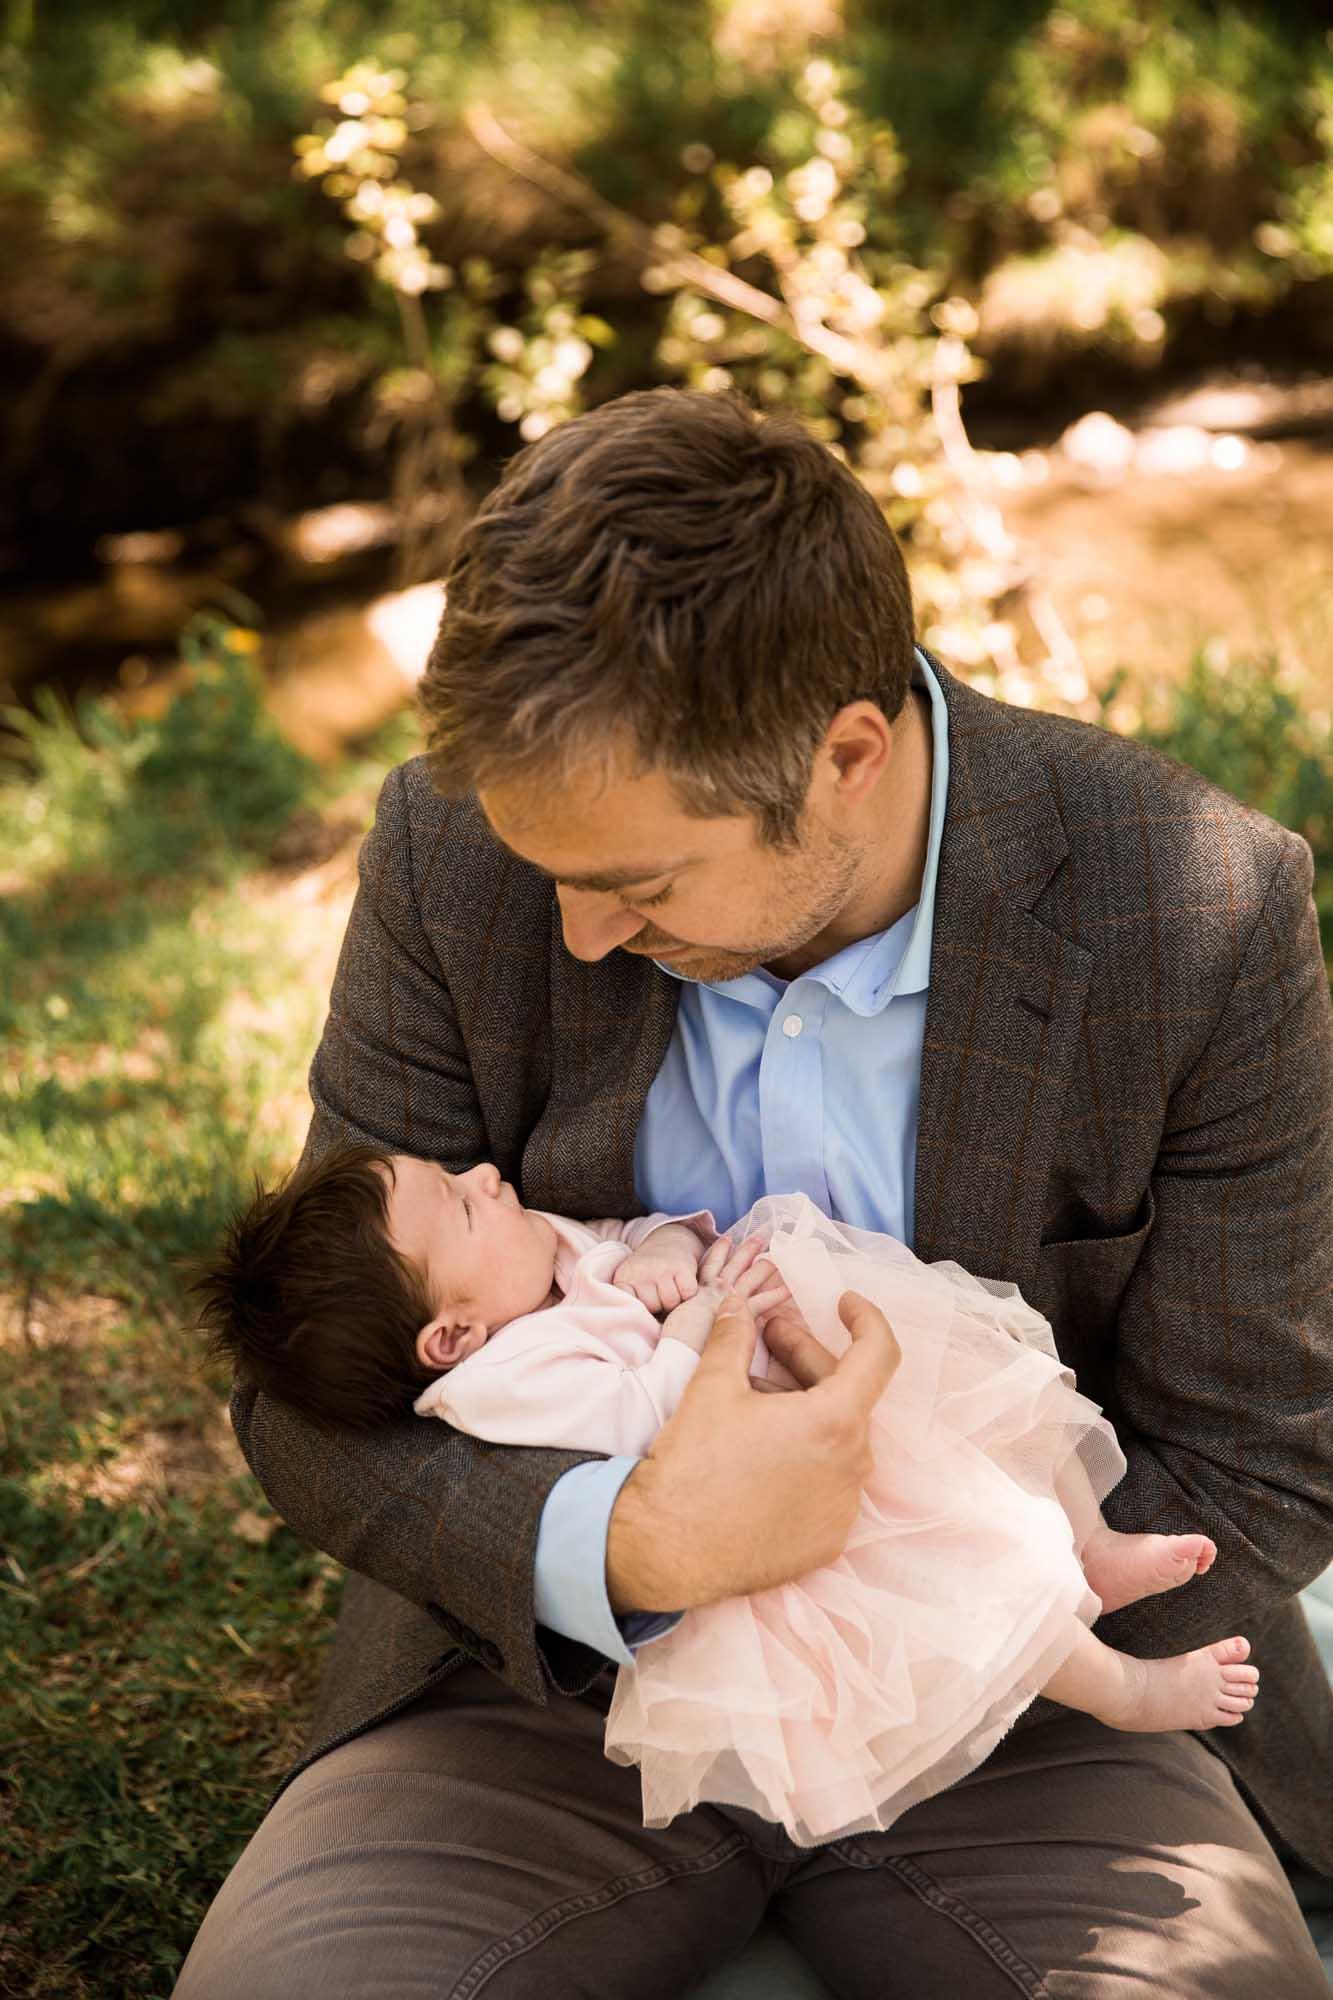 Calgary family maternity and newborn photographer, family photo at Confederation Park